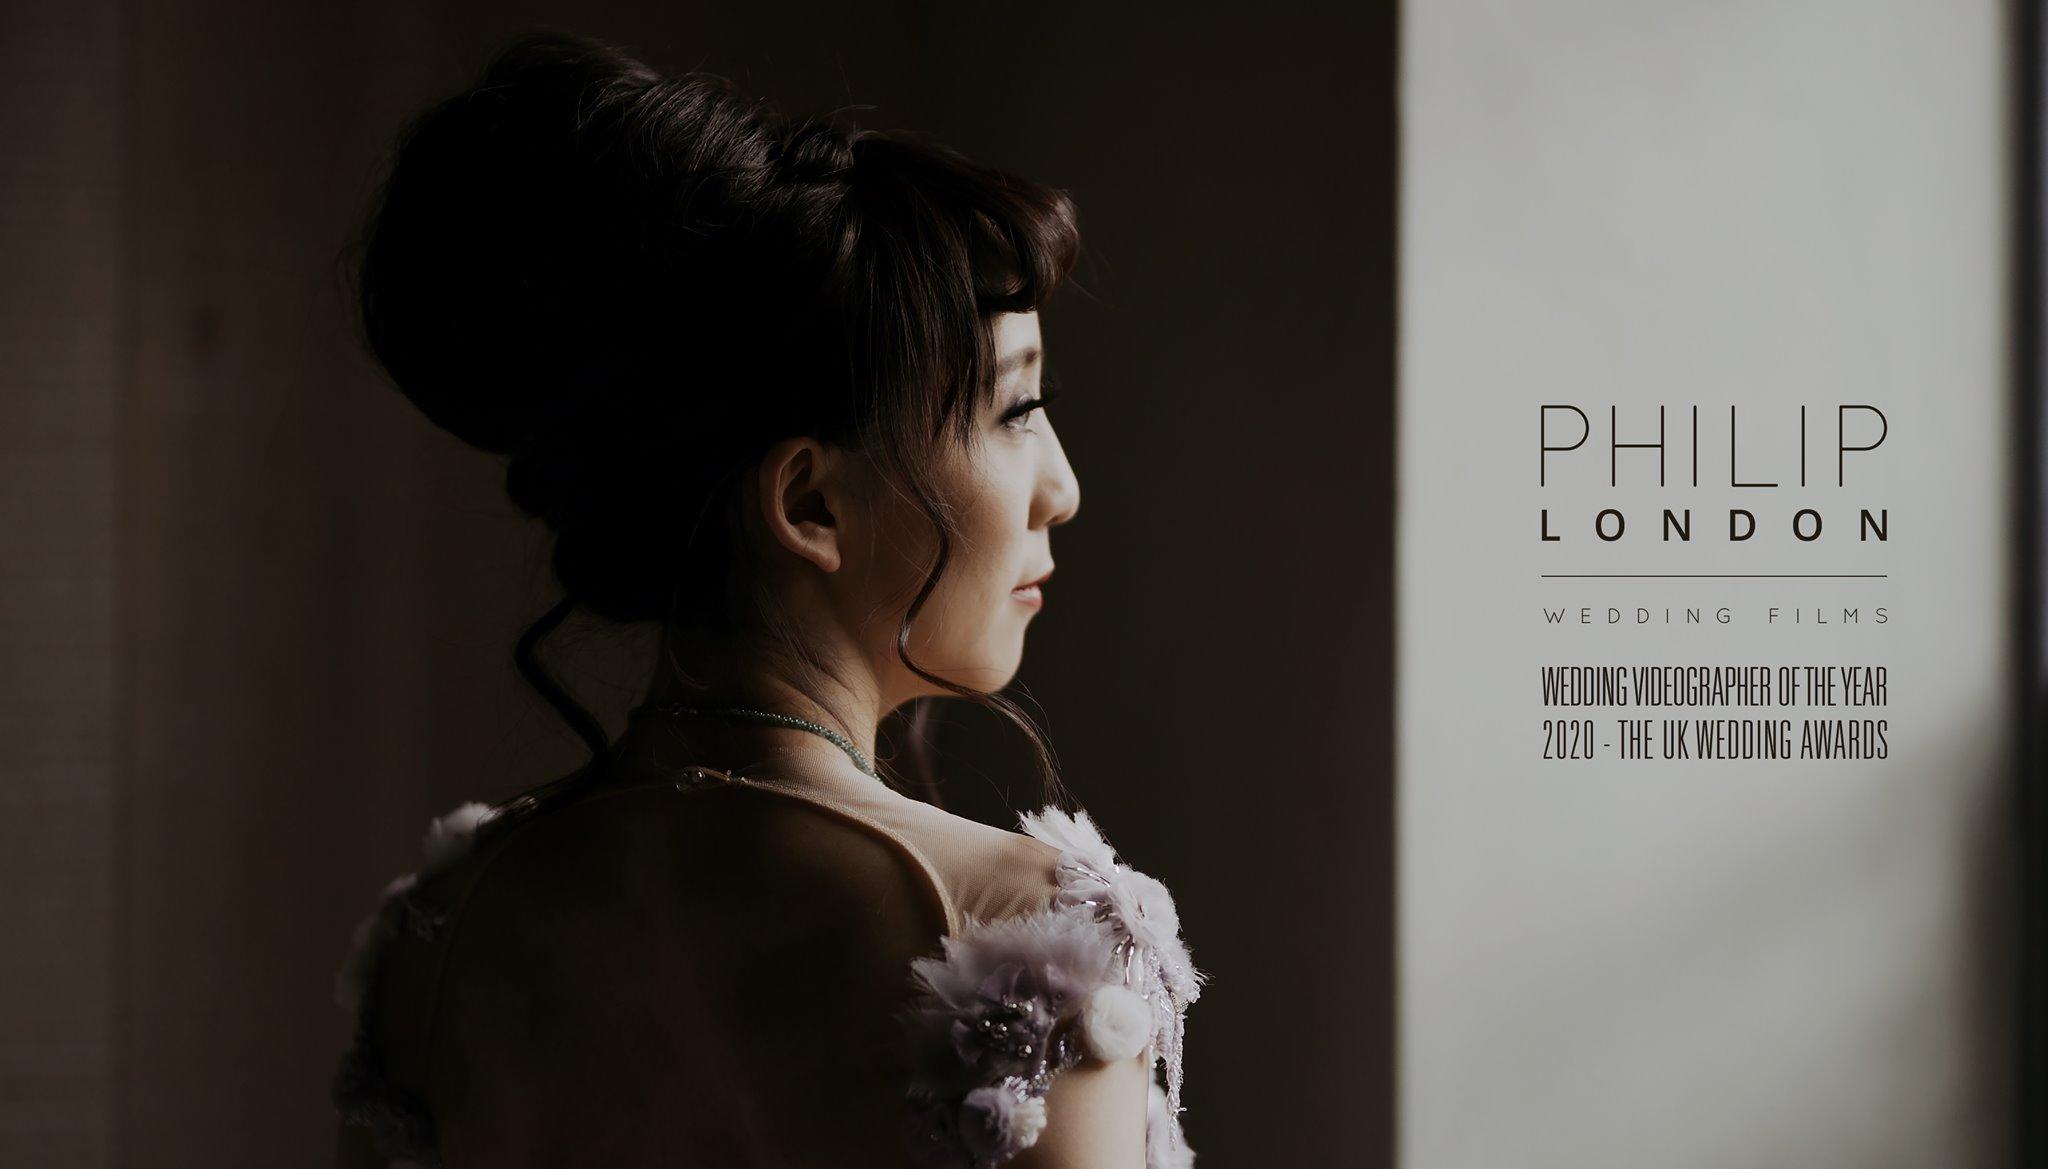 philip-london-best-UK-wedding-videographer-of-the-year